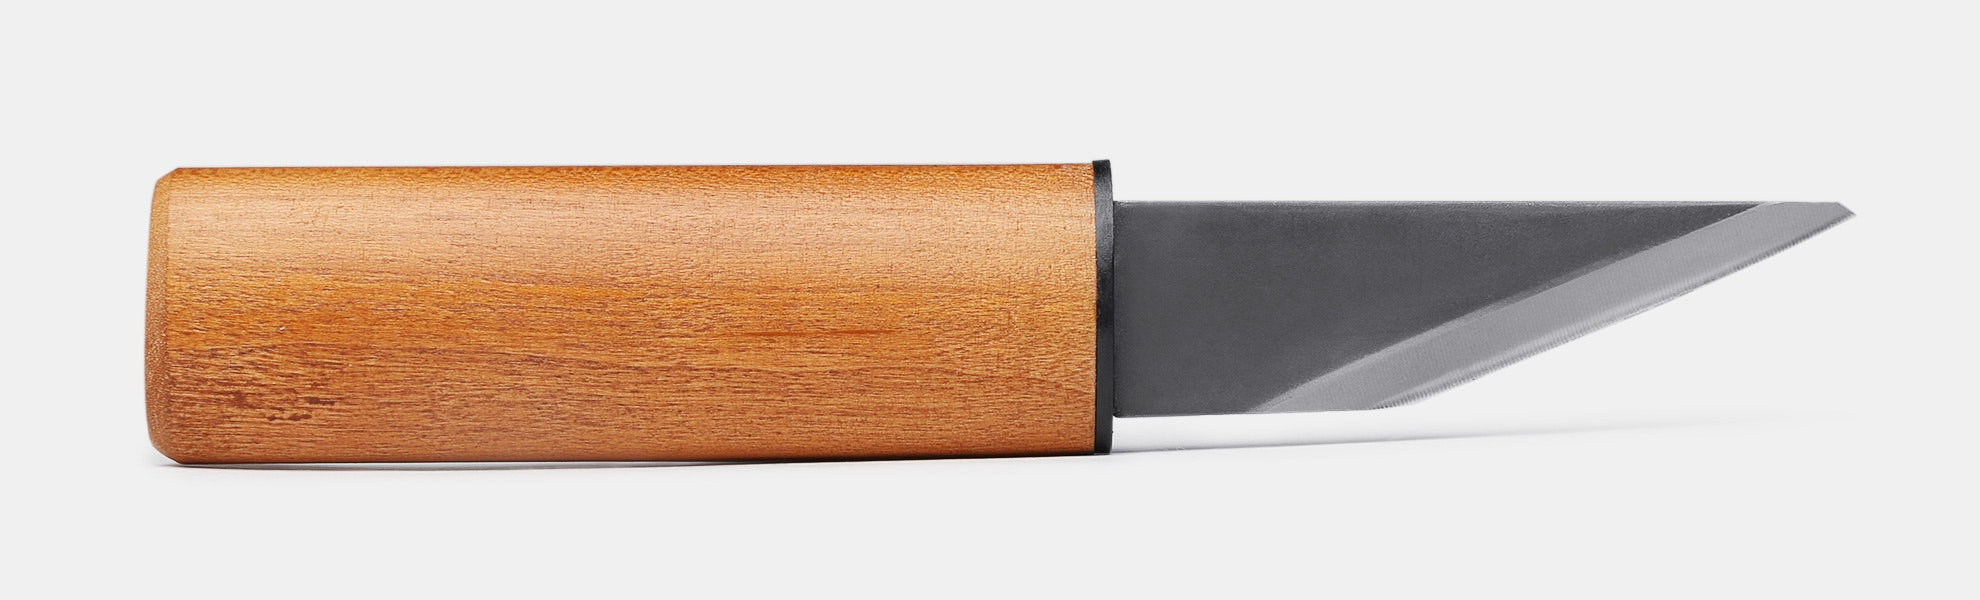 Kanetsune Kiridashi Fixed Blade Knife